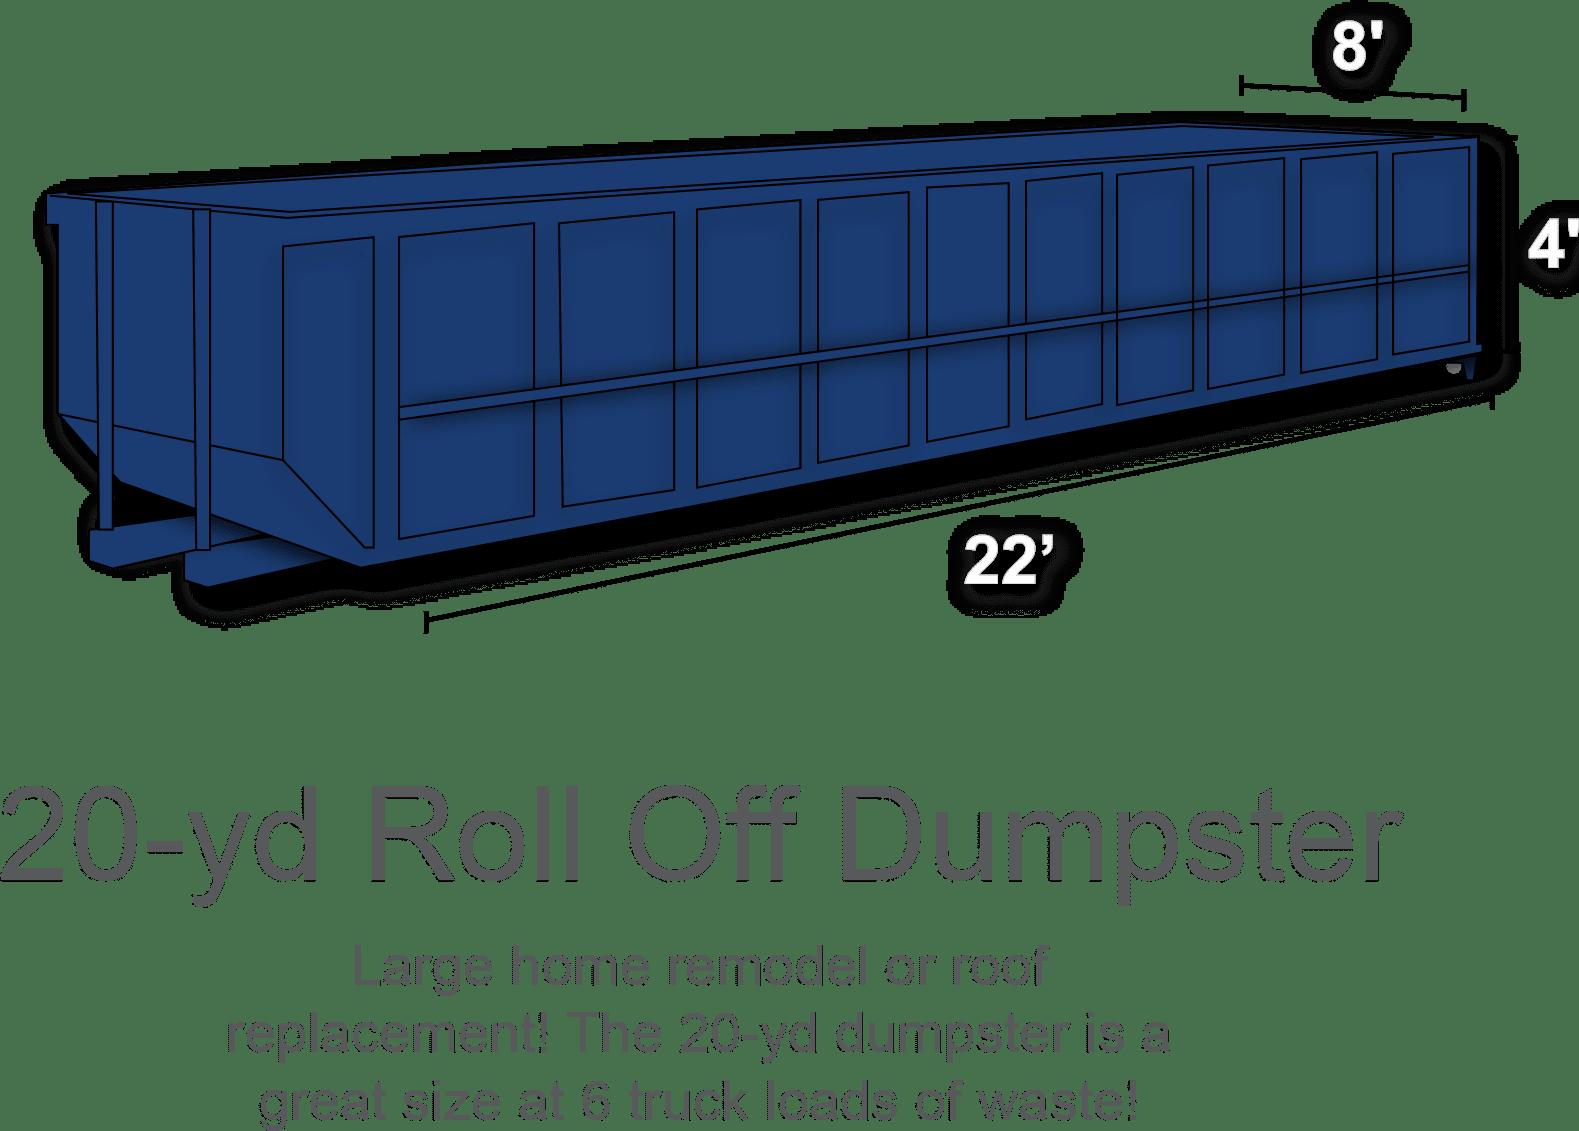 20 yard roll off dumpster rental